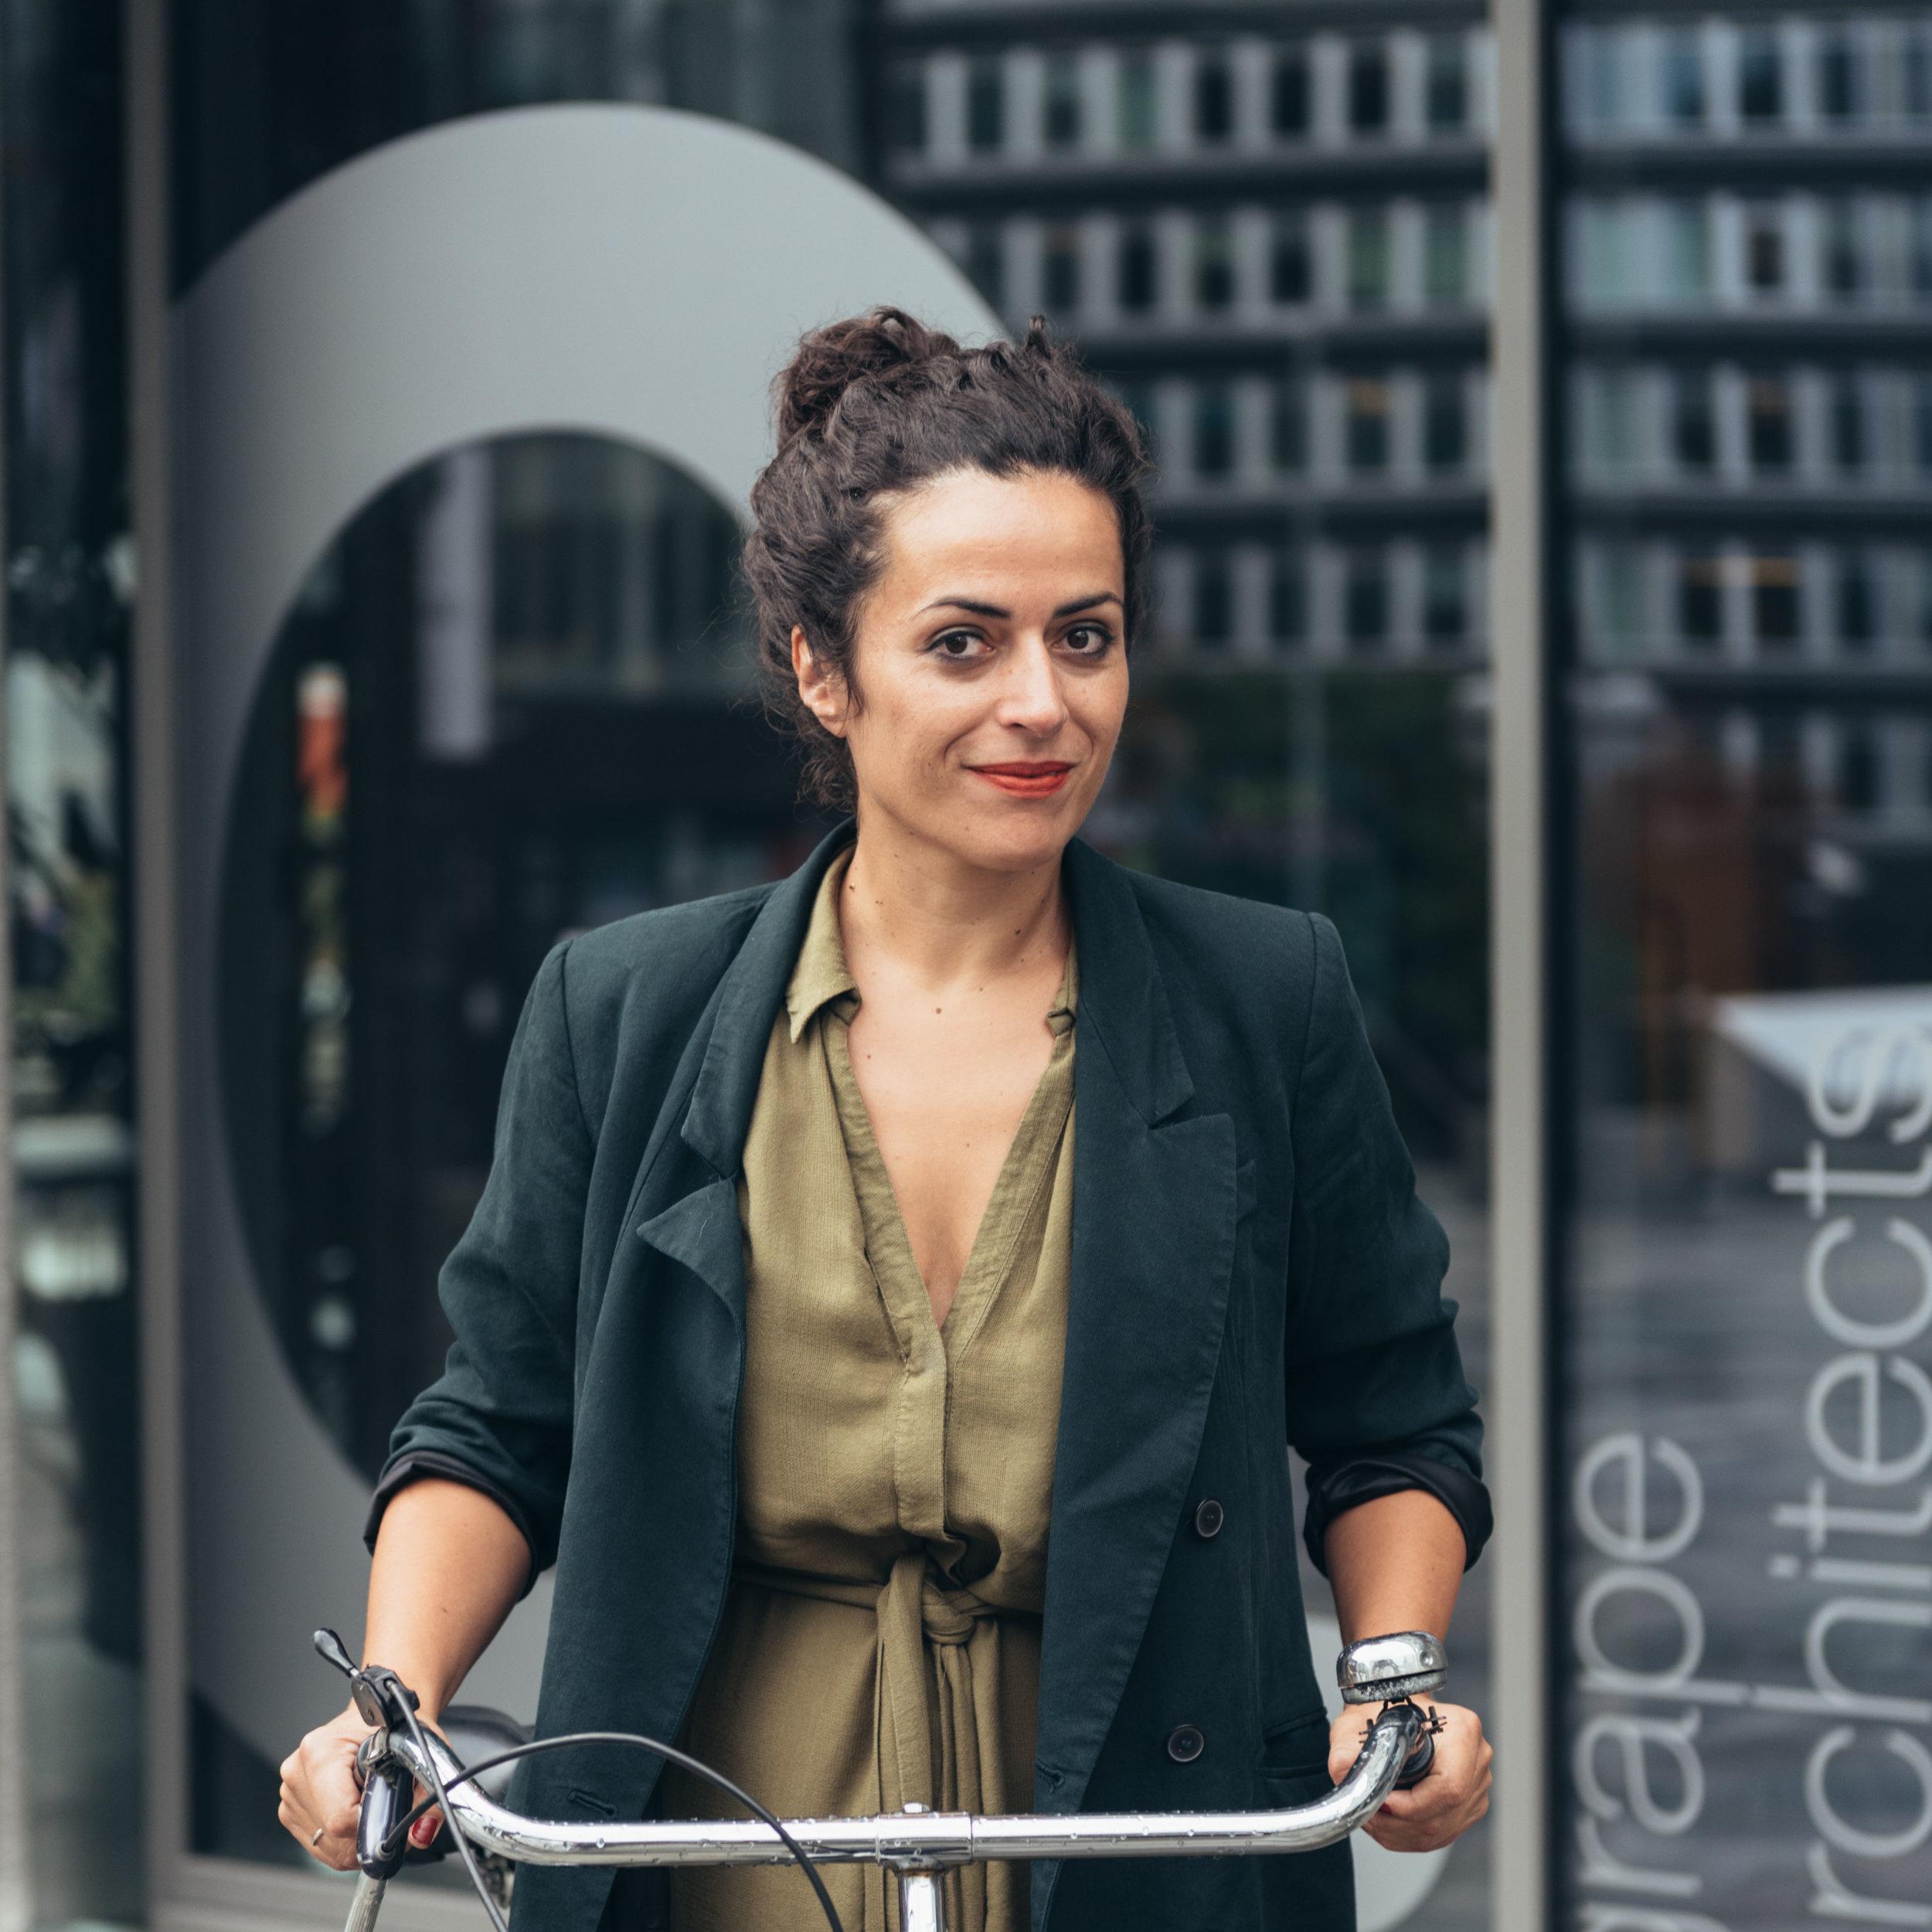 Isabel Ruiz Lopez   Master of Architecture and Urban Planning  0047 968 26 316   isabel@grape.no